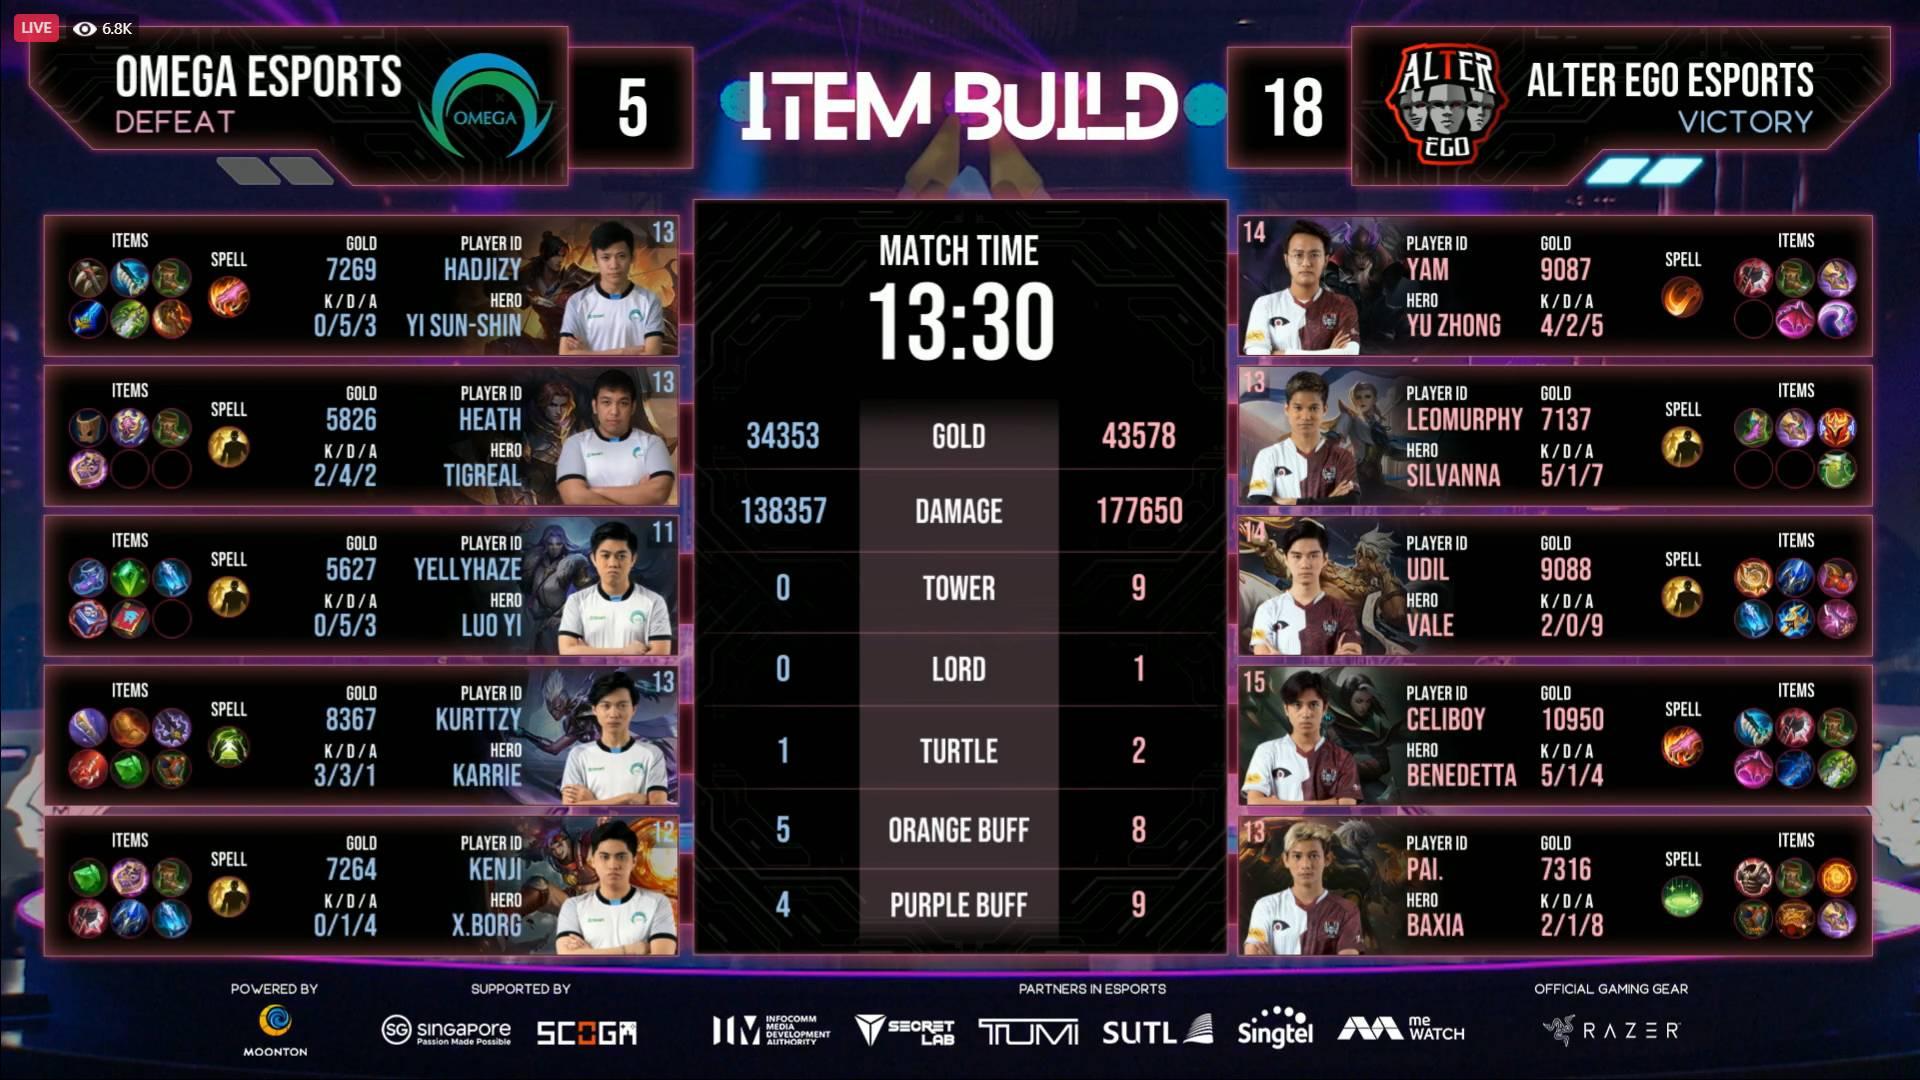 2021-M2-World-Championship-Alter-Ego-def-Omega-Game-Two SMART Omega bows out of M2 World Championship ESports Mobile Legends MPL-PH News  - philippine sports news